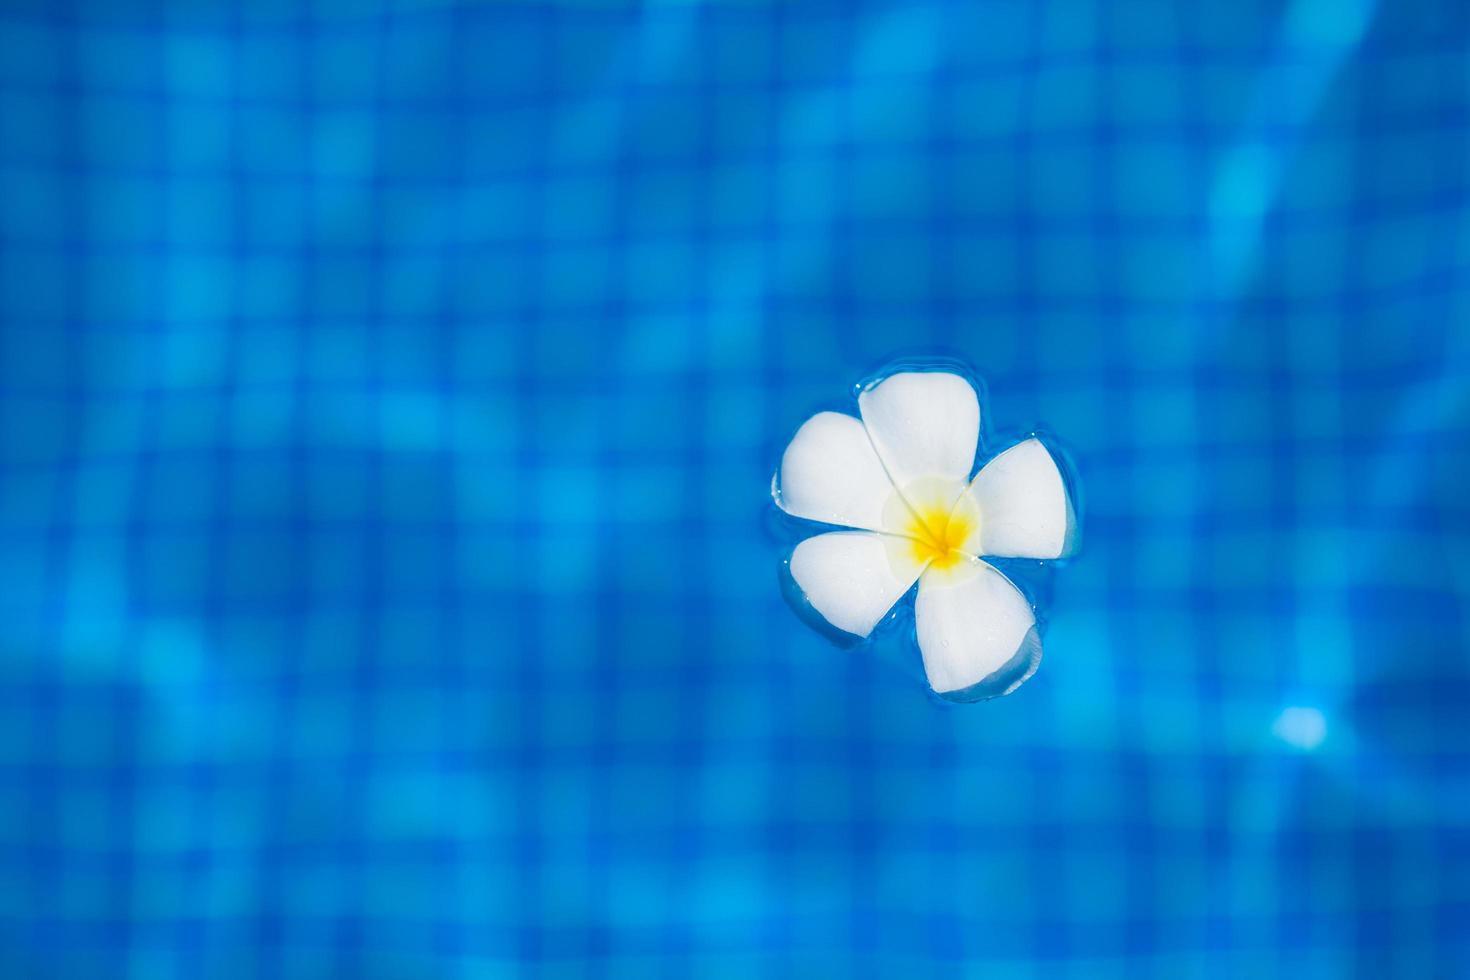 plumeria bloem drijvend in blauw water foto